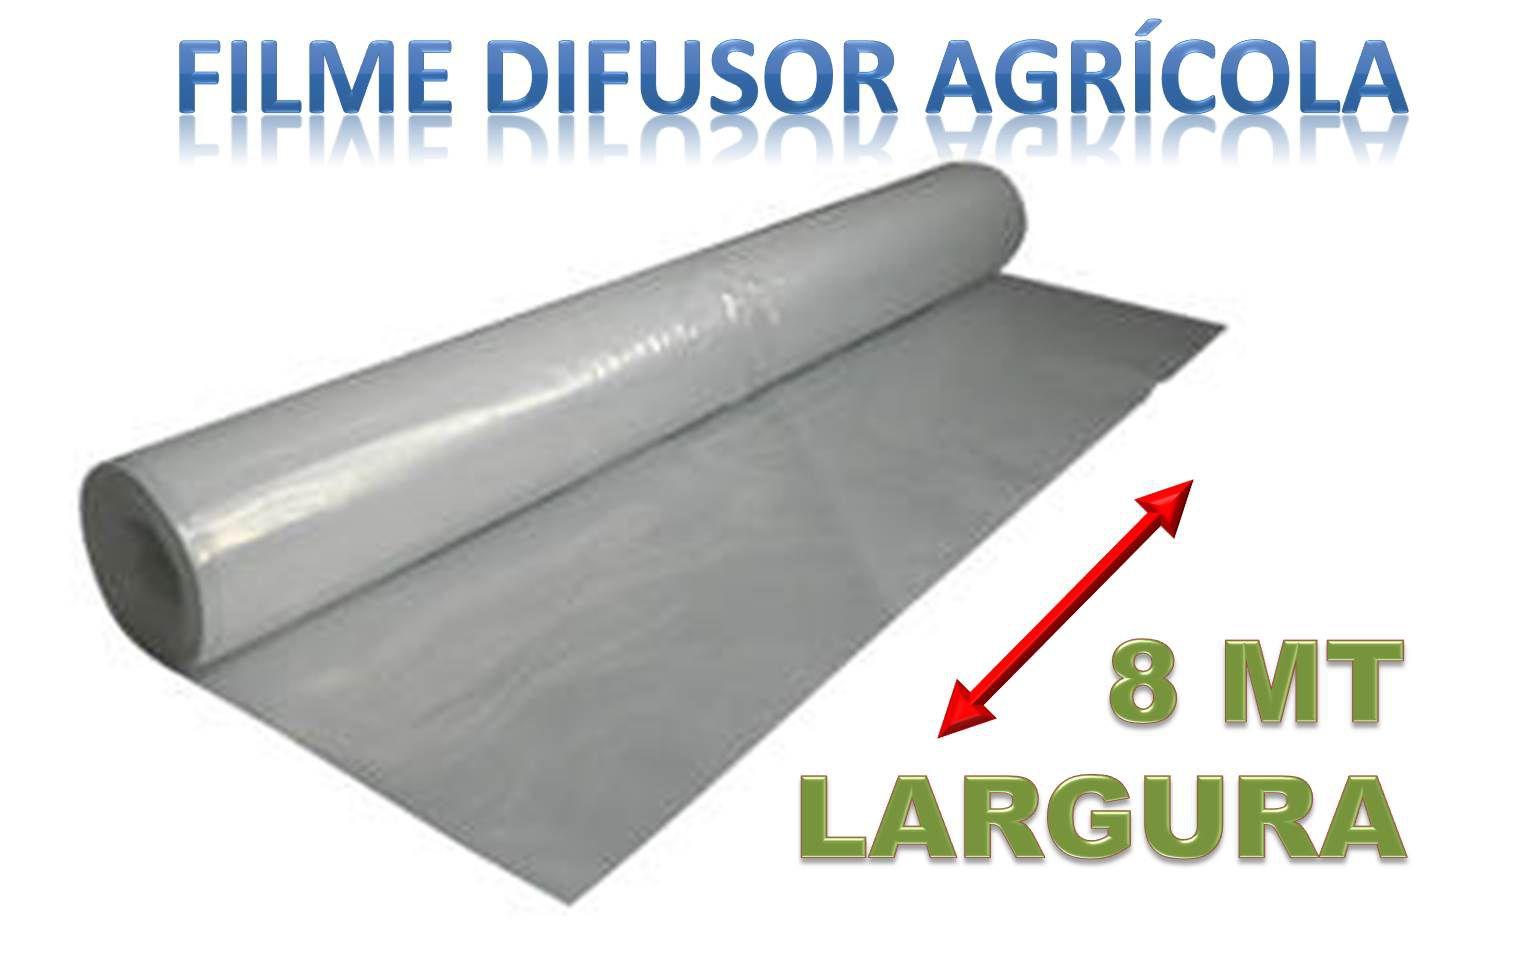 FILME DIFUSOR AGRICOLA  - 8 MT LARGURA